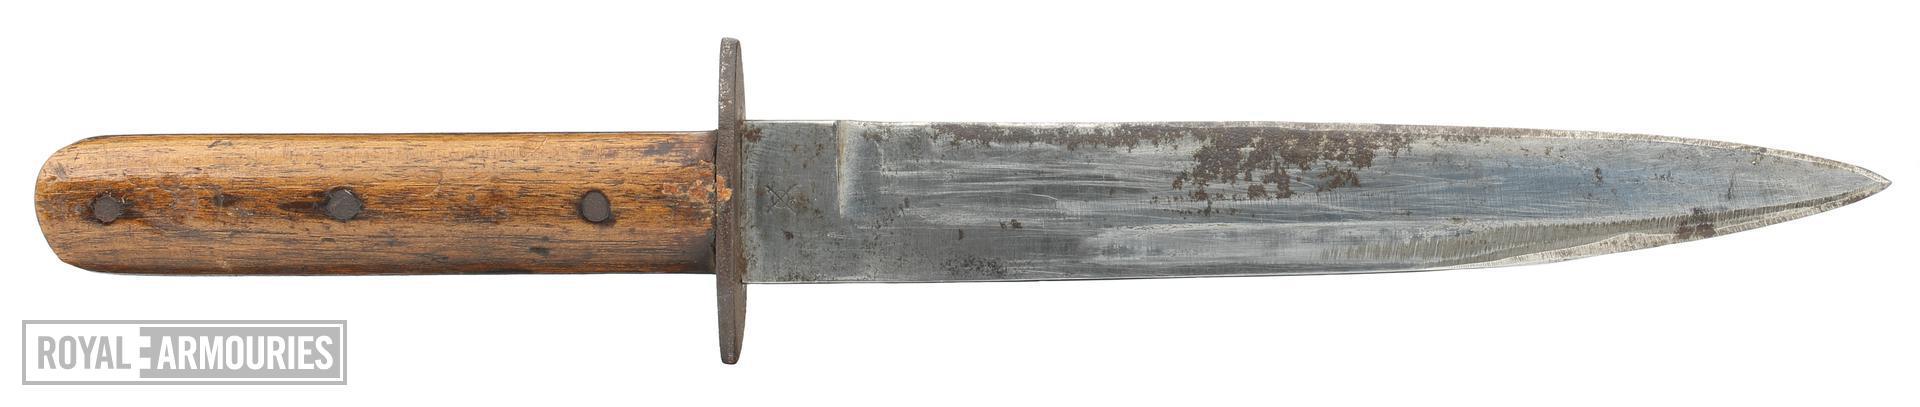 Dagger - Trench dagger